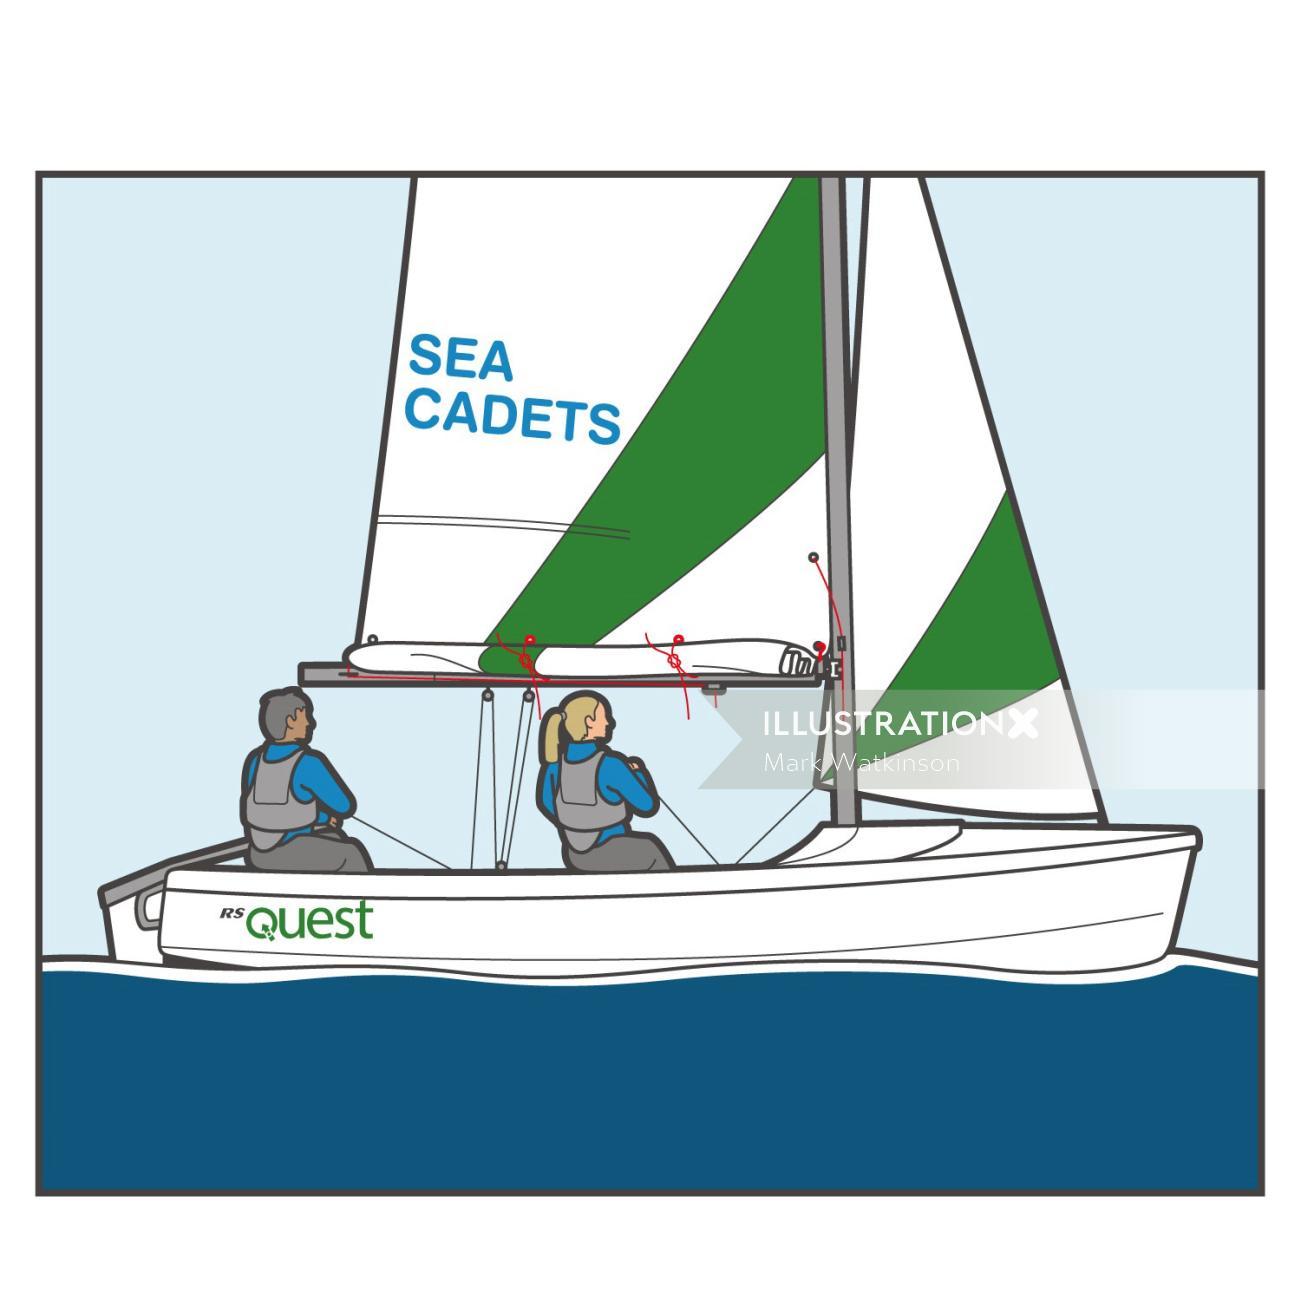 Sea cadets transport illustration